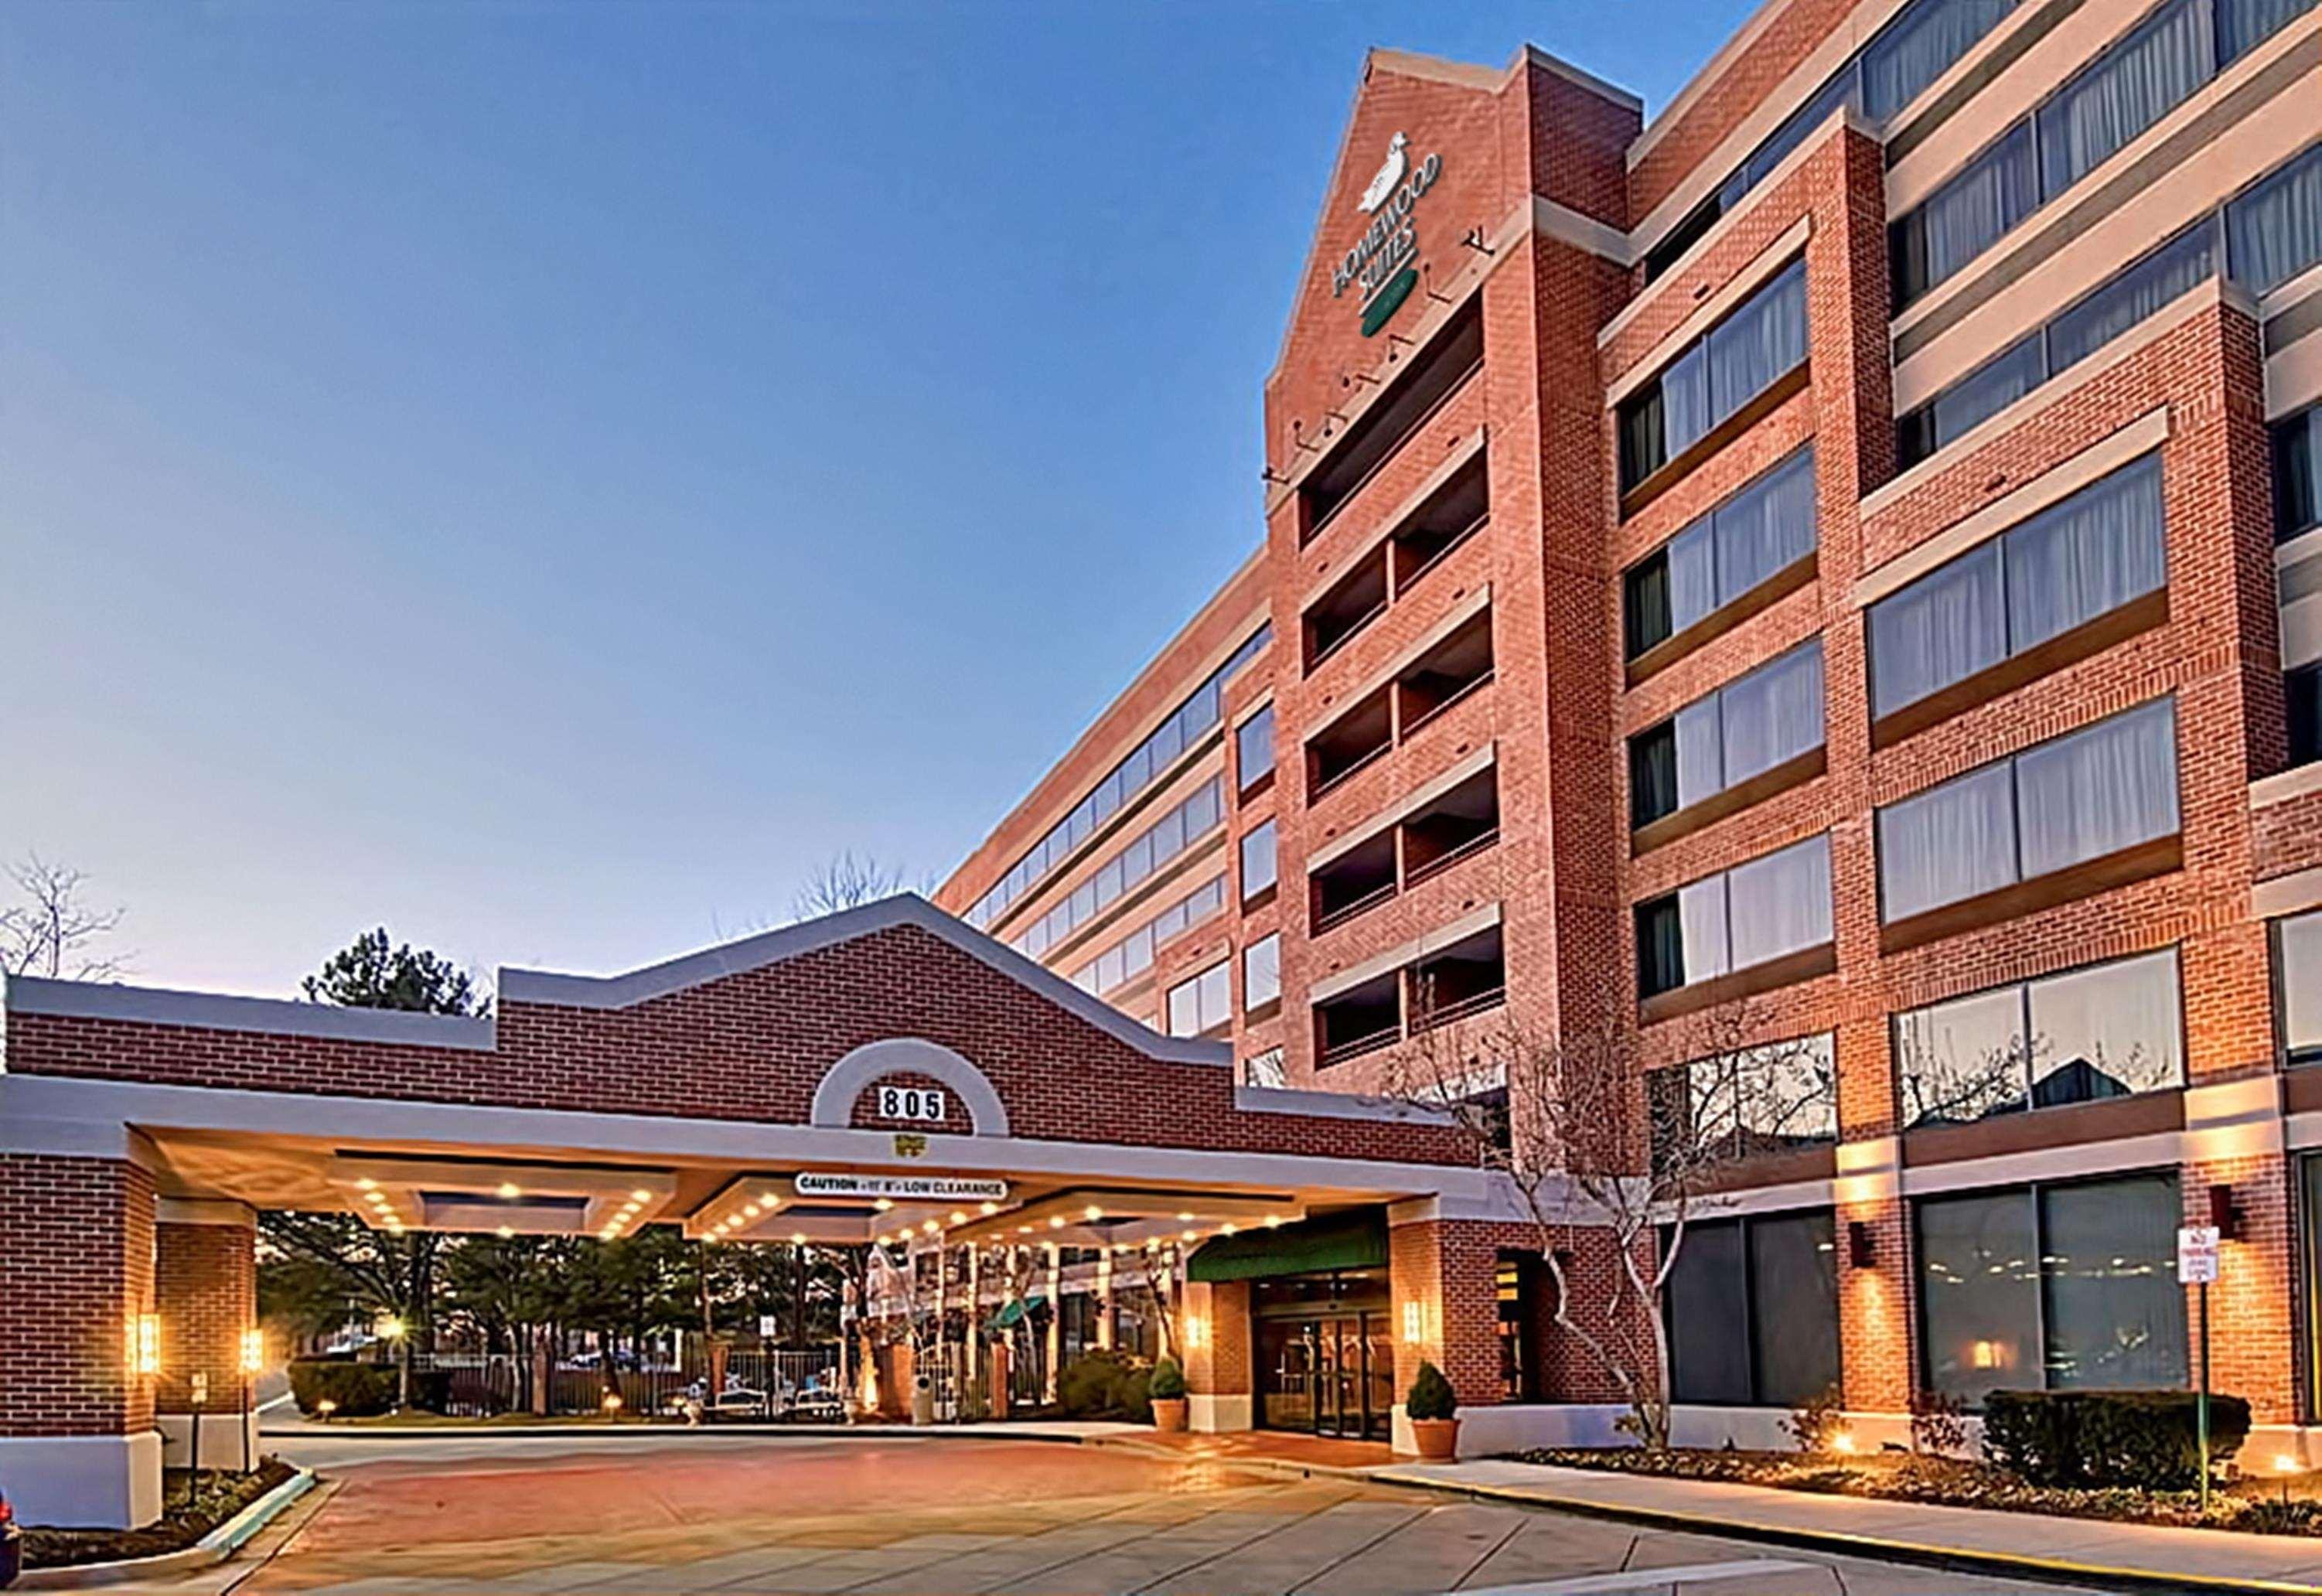 Homewood Suites by Hilton Gaithersburg/ Washington, DC North